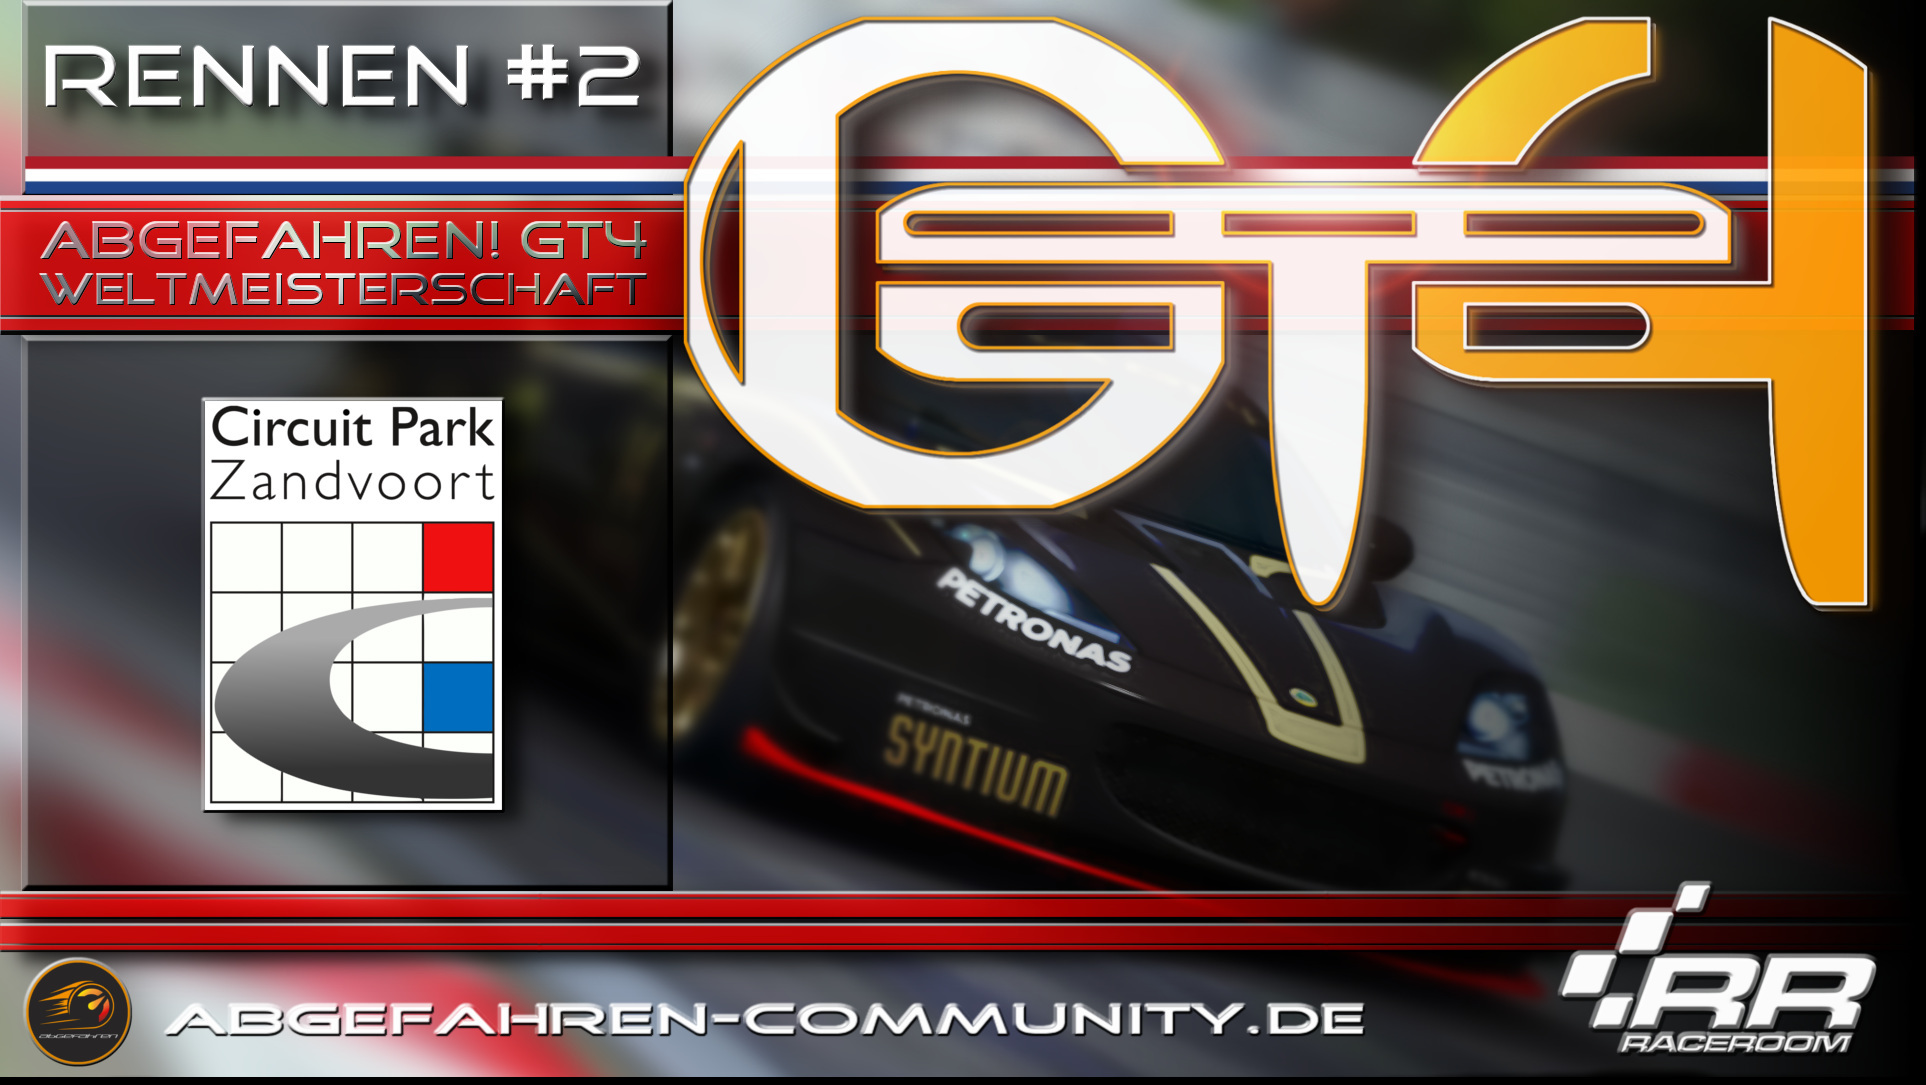 Abgefahren R3E -  GT4 Weltmeisterschaft | Rennen #2 Circuit Zandvoort | Grand Prix